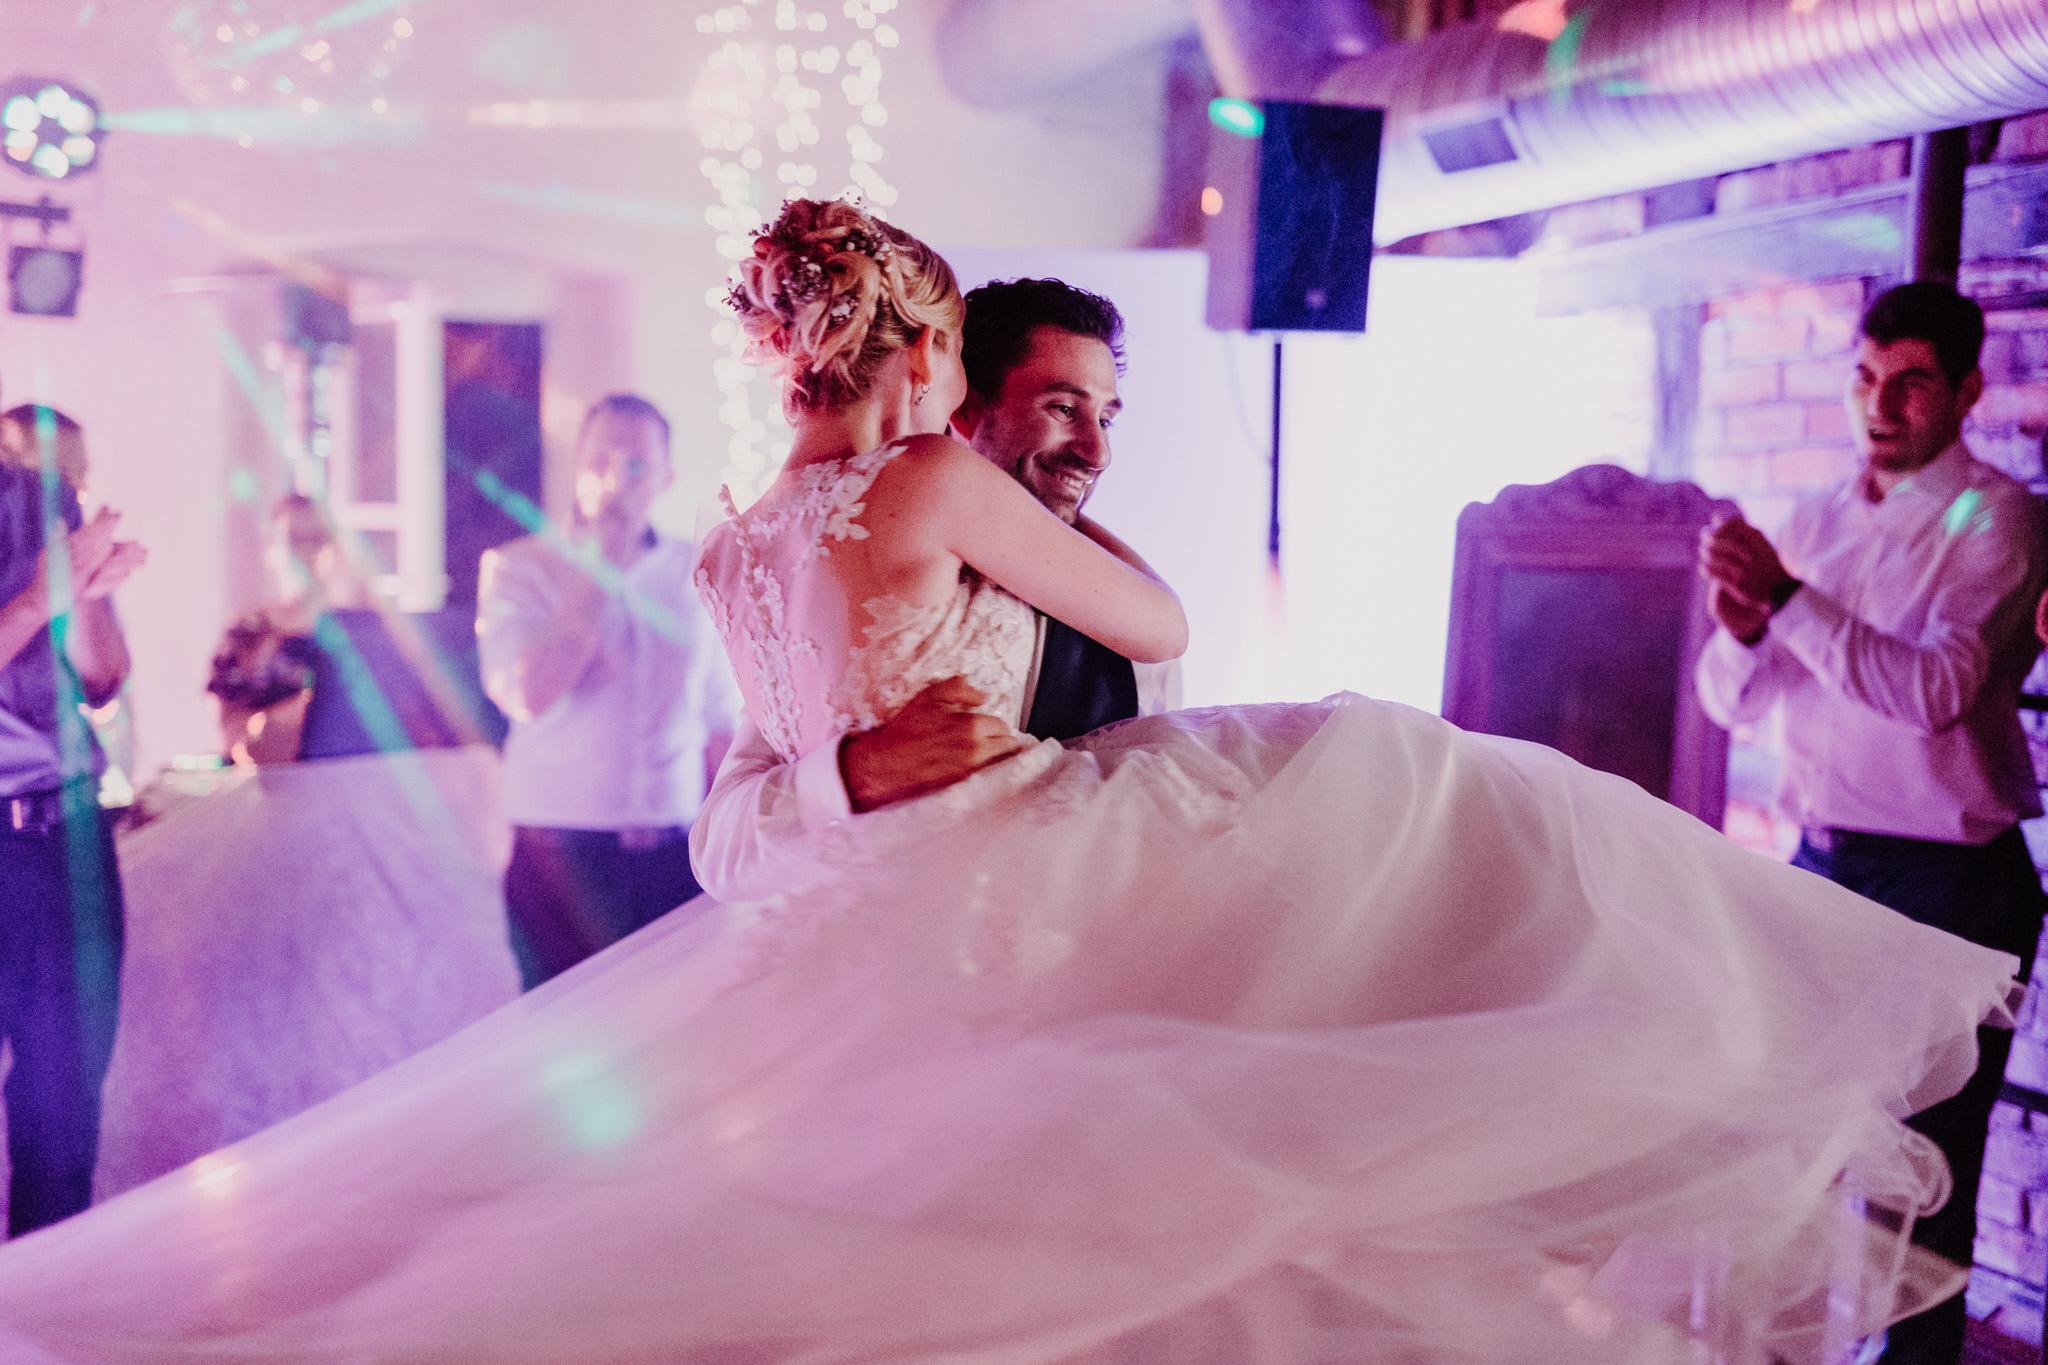 Hochzeit Heidersbacher Mühle I Couple I Shooting I Wedding I Hochzeit IThüringen Hochzeitsfotografie I Wedding Photography